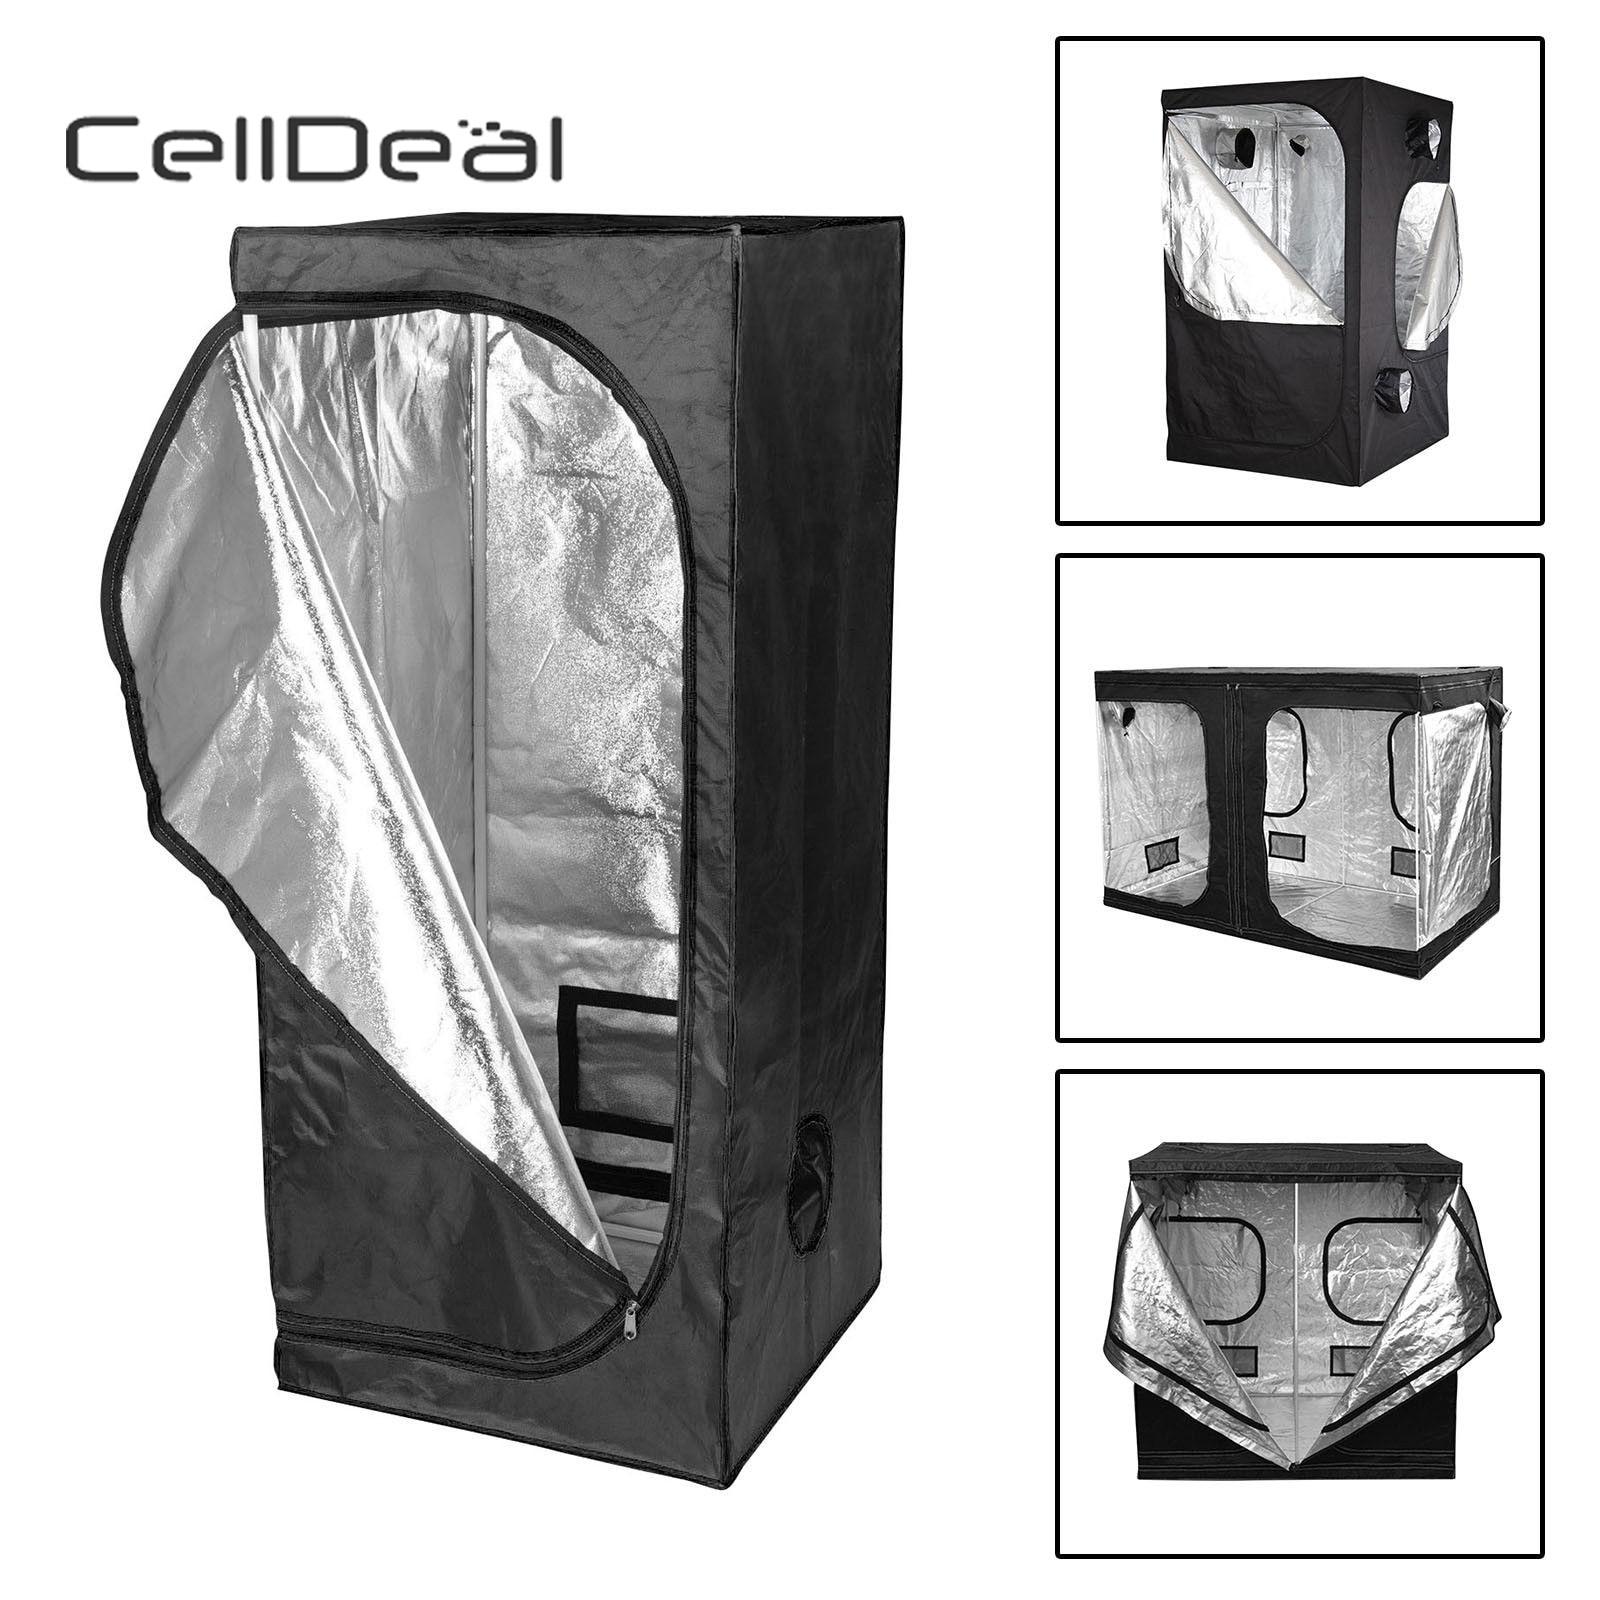 CellDeal Premium Grow Tent…